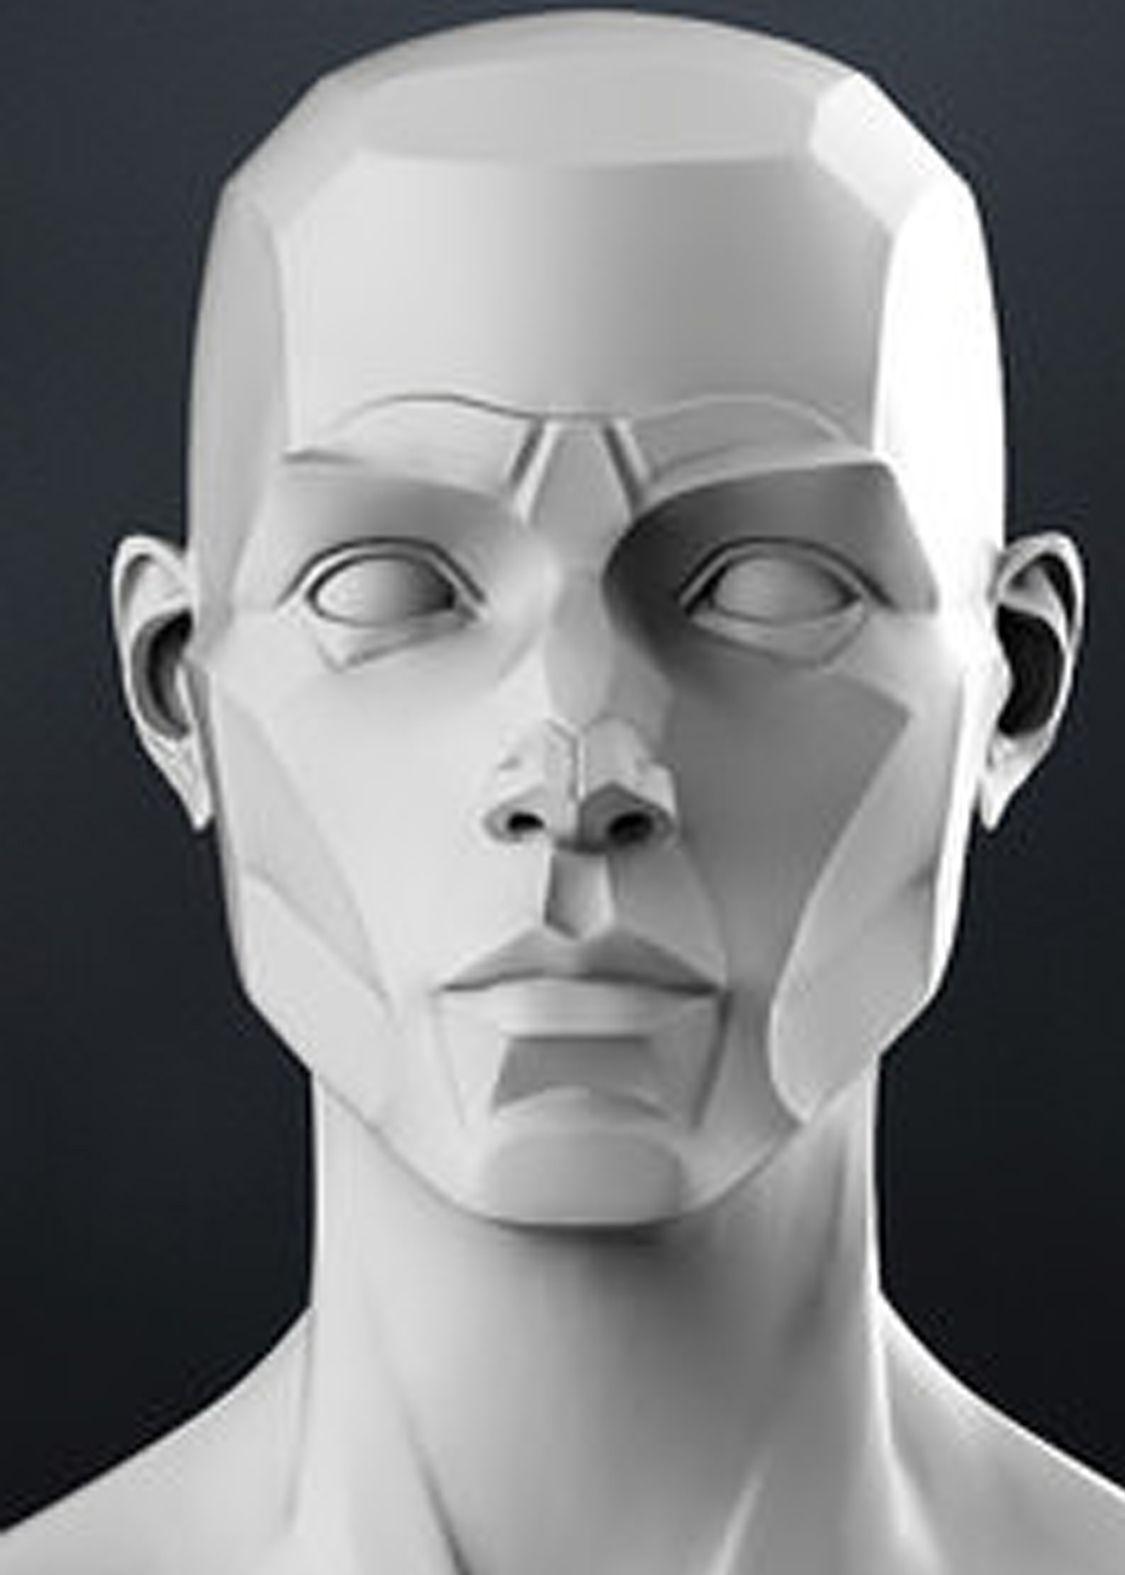 automob 3d anatomy tutorial - 736×1030